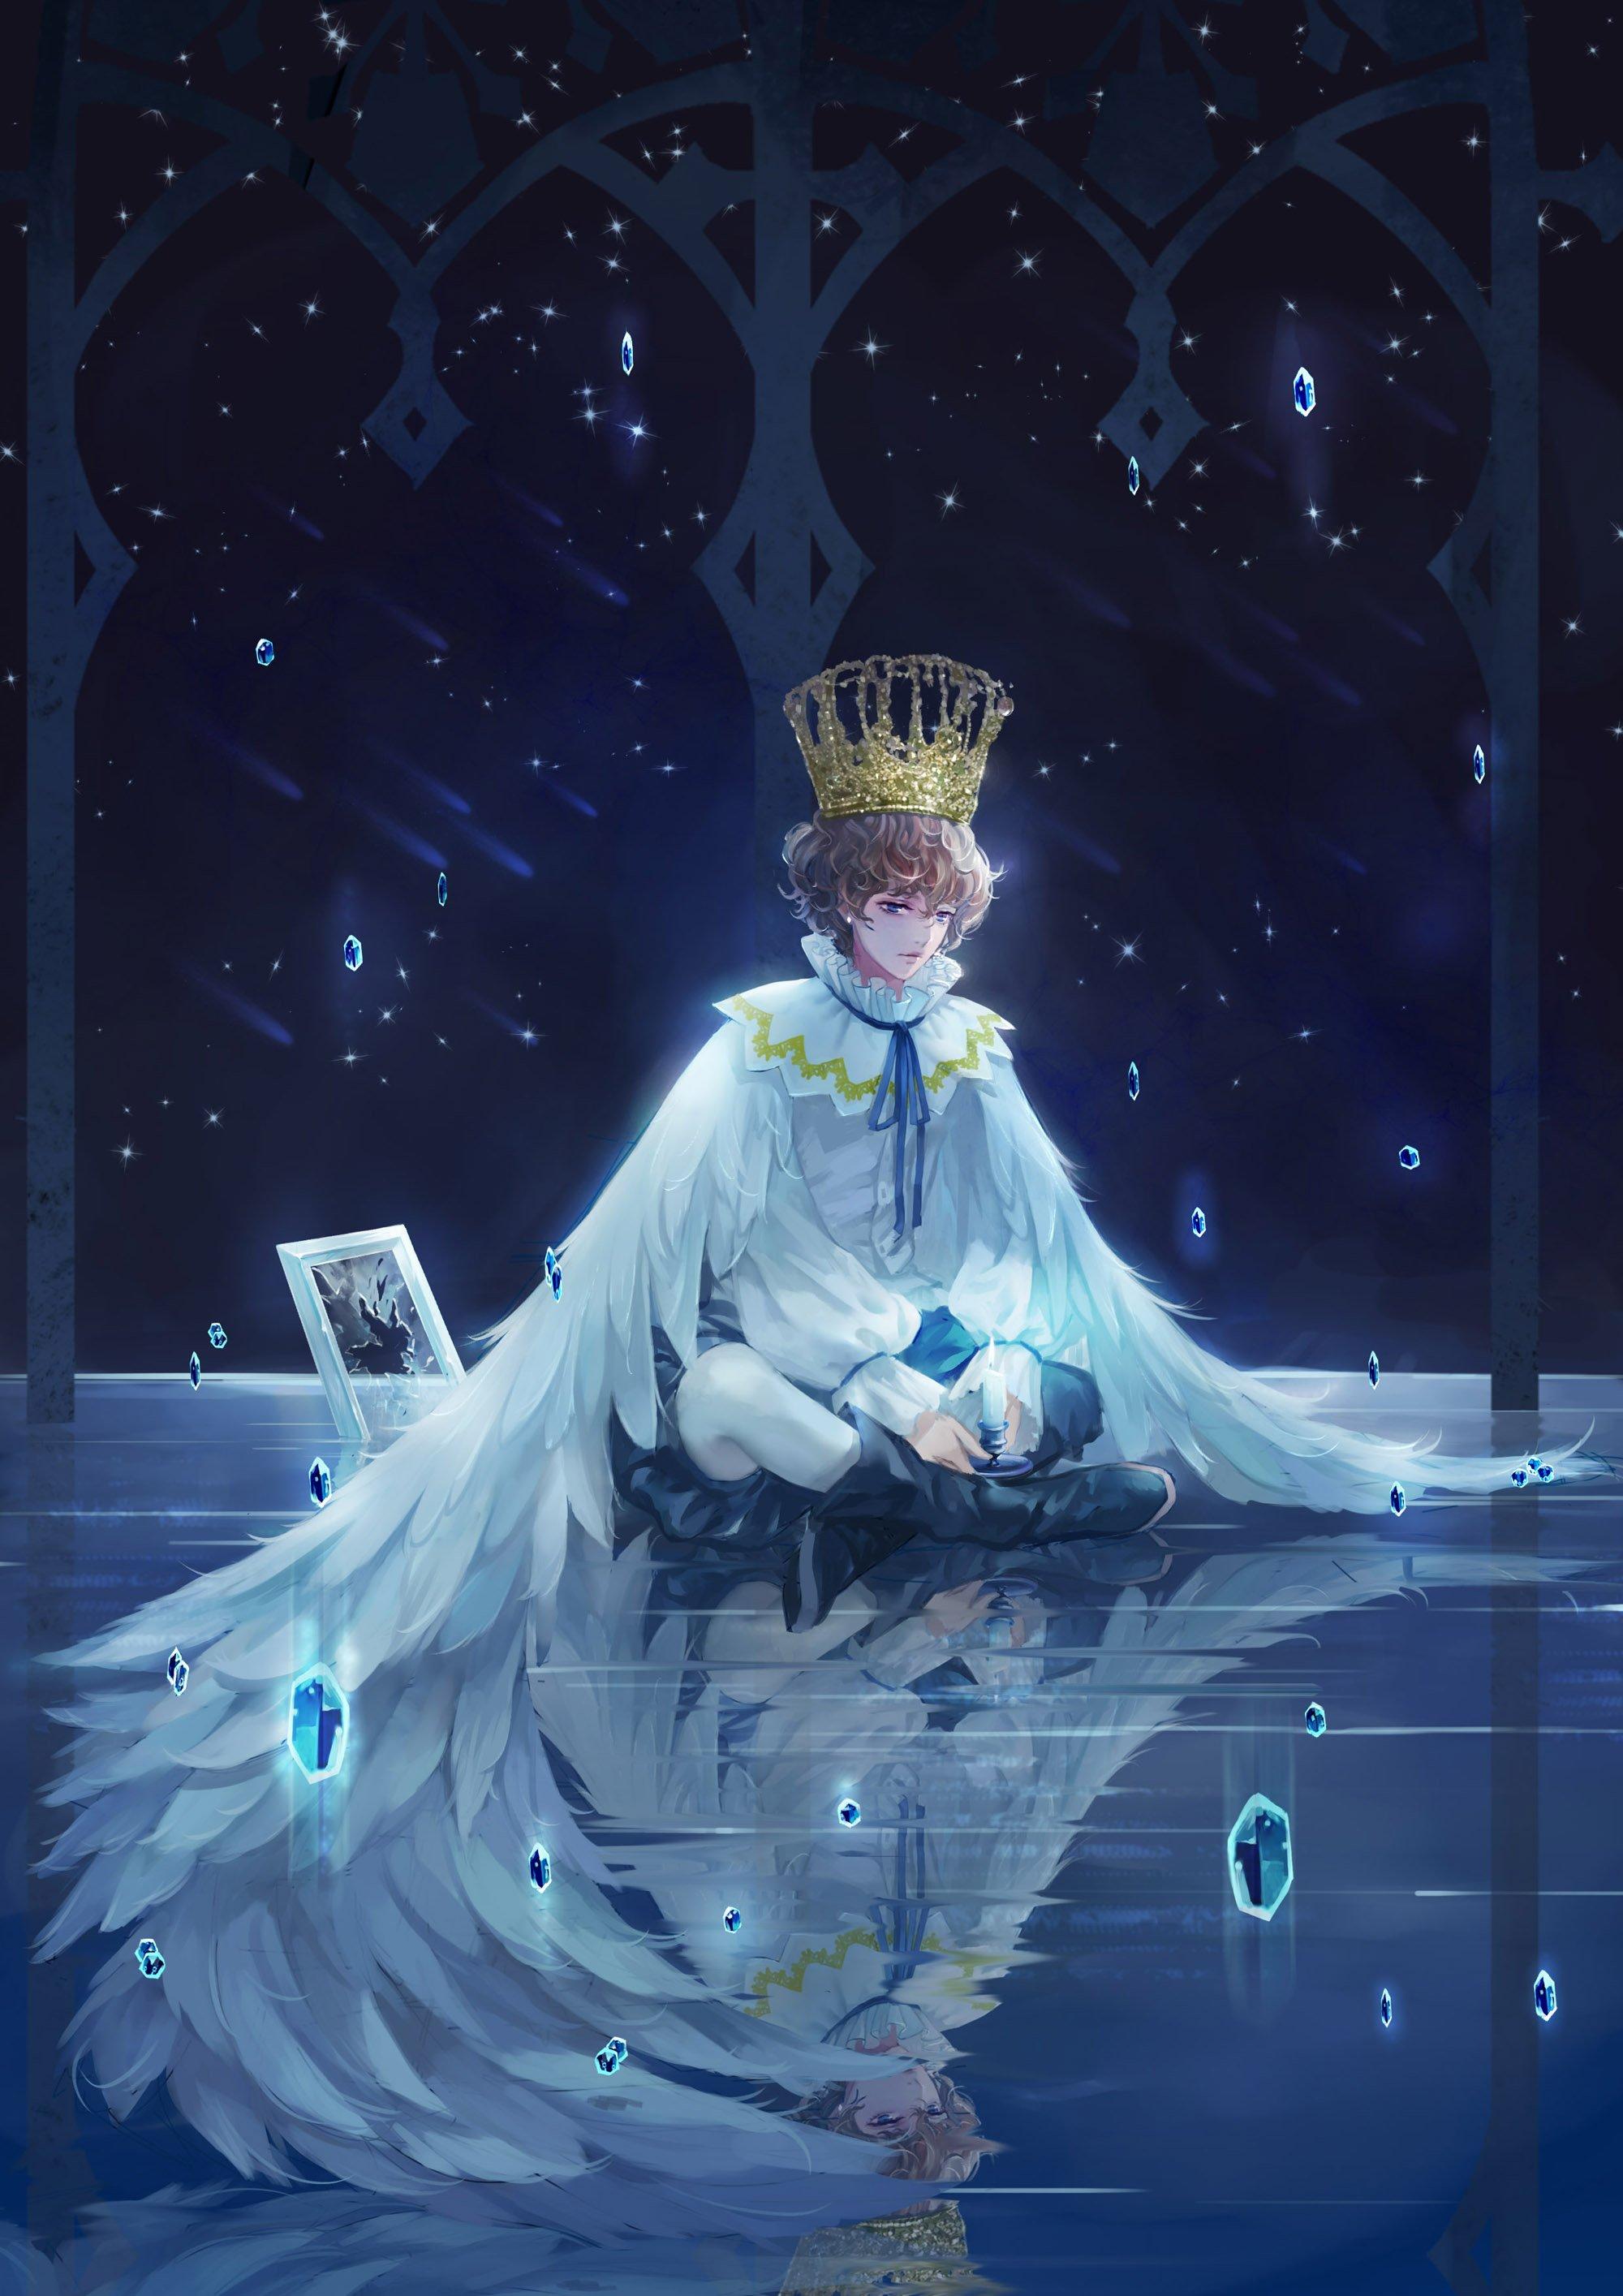 Sad Baby Girl Wallpaper Download Boy Wings Night Alone Anime Wallpaper 2000x2829 666205